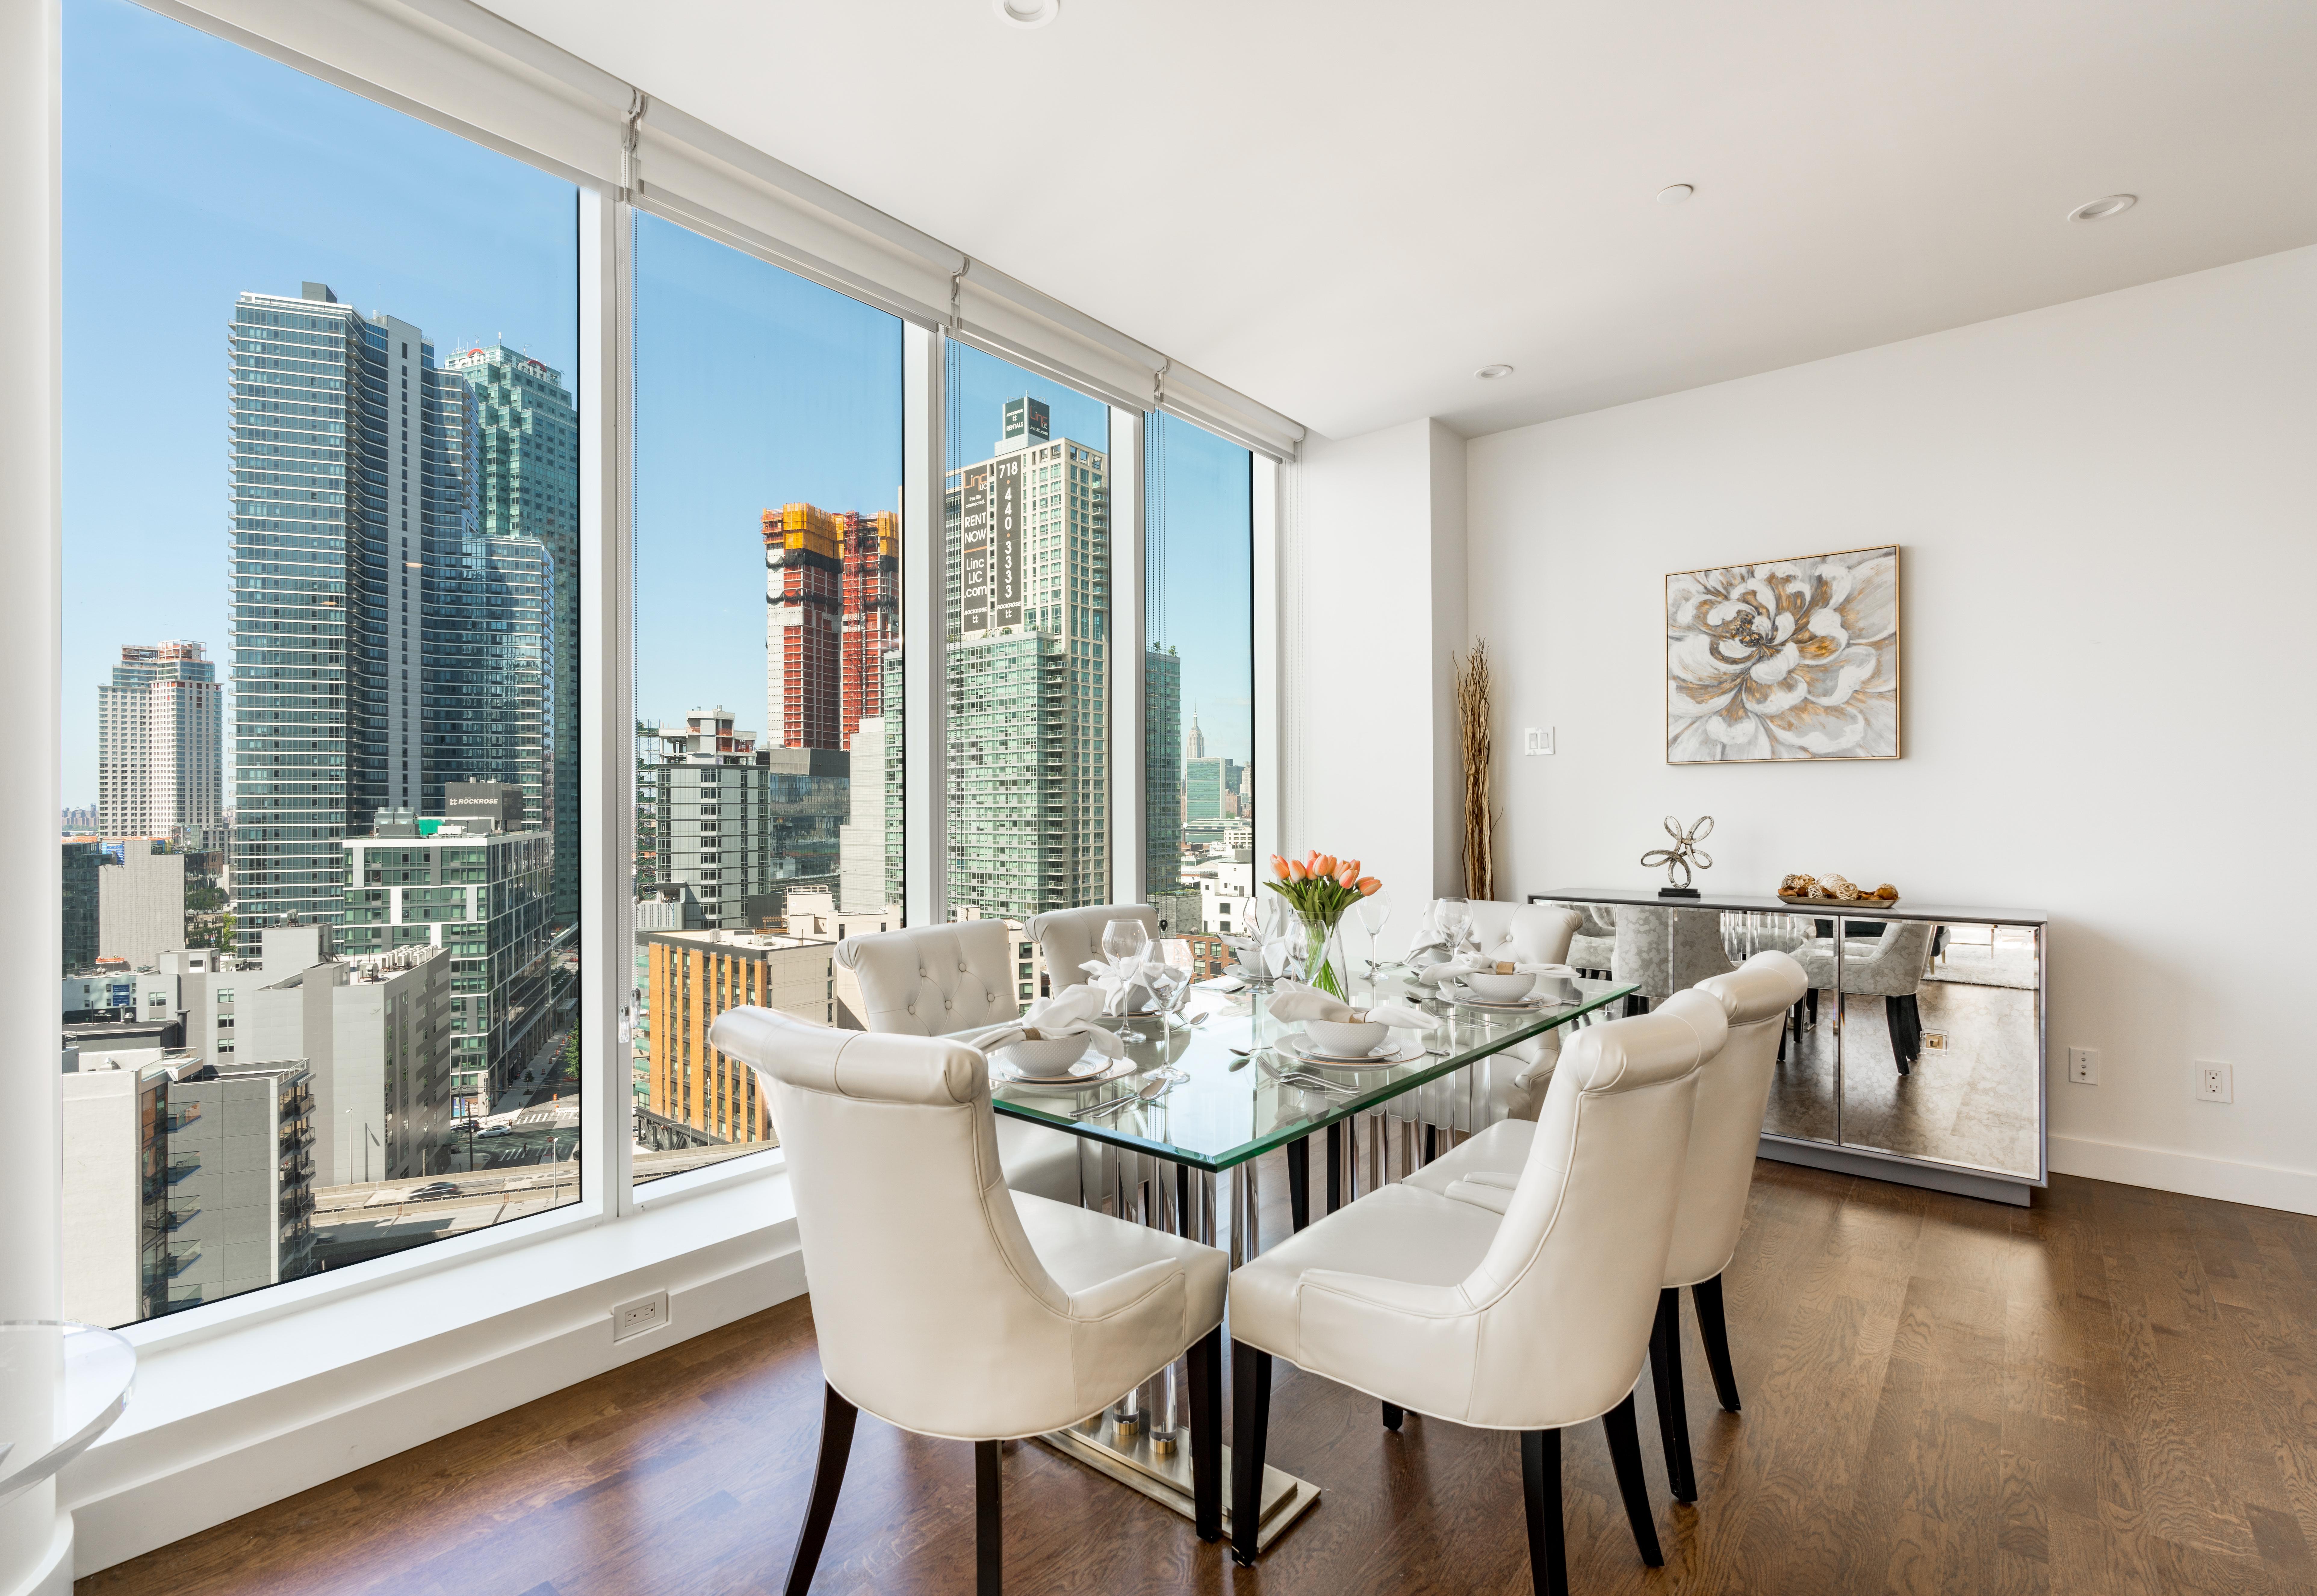 New Development, New York City, Luxury C